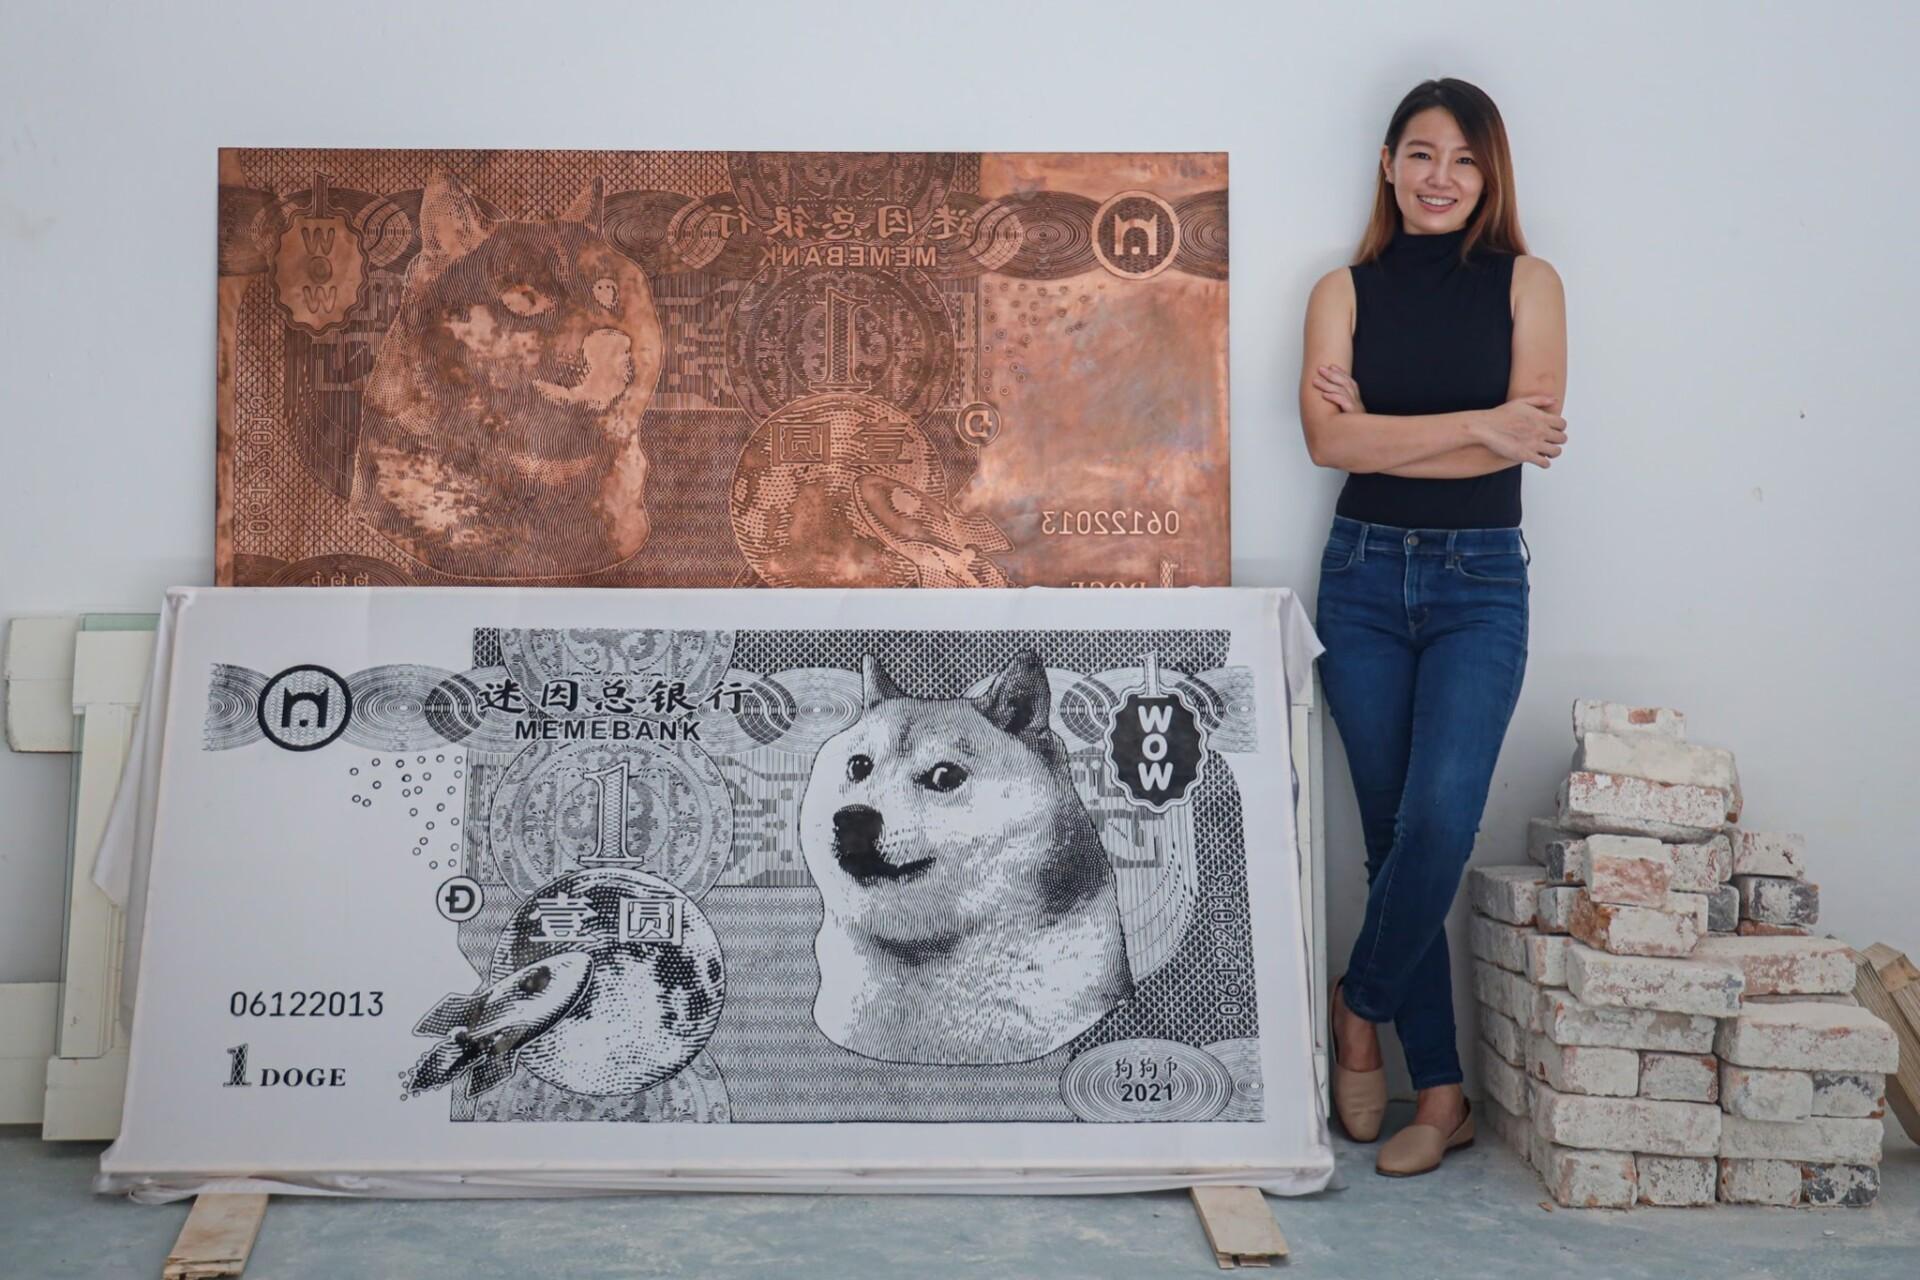 Meme = Money: Malaysian Artist Sells NFT For Over RM320,000